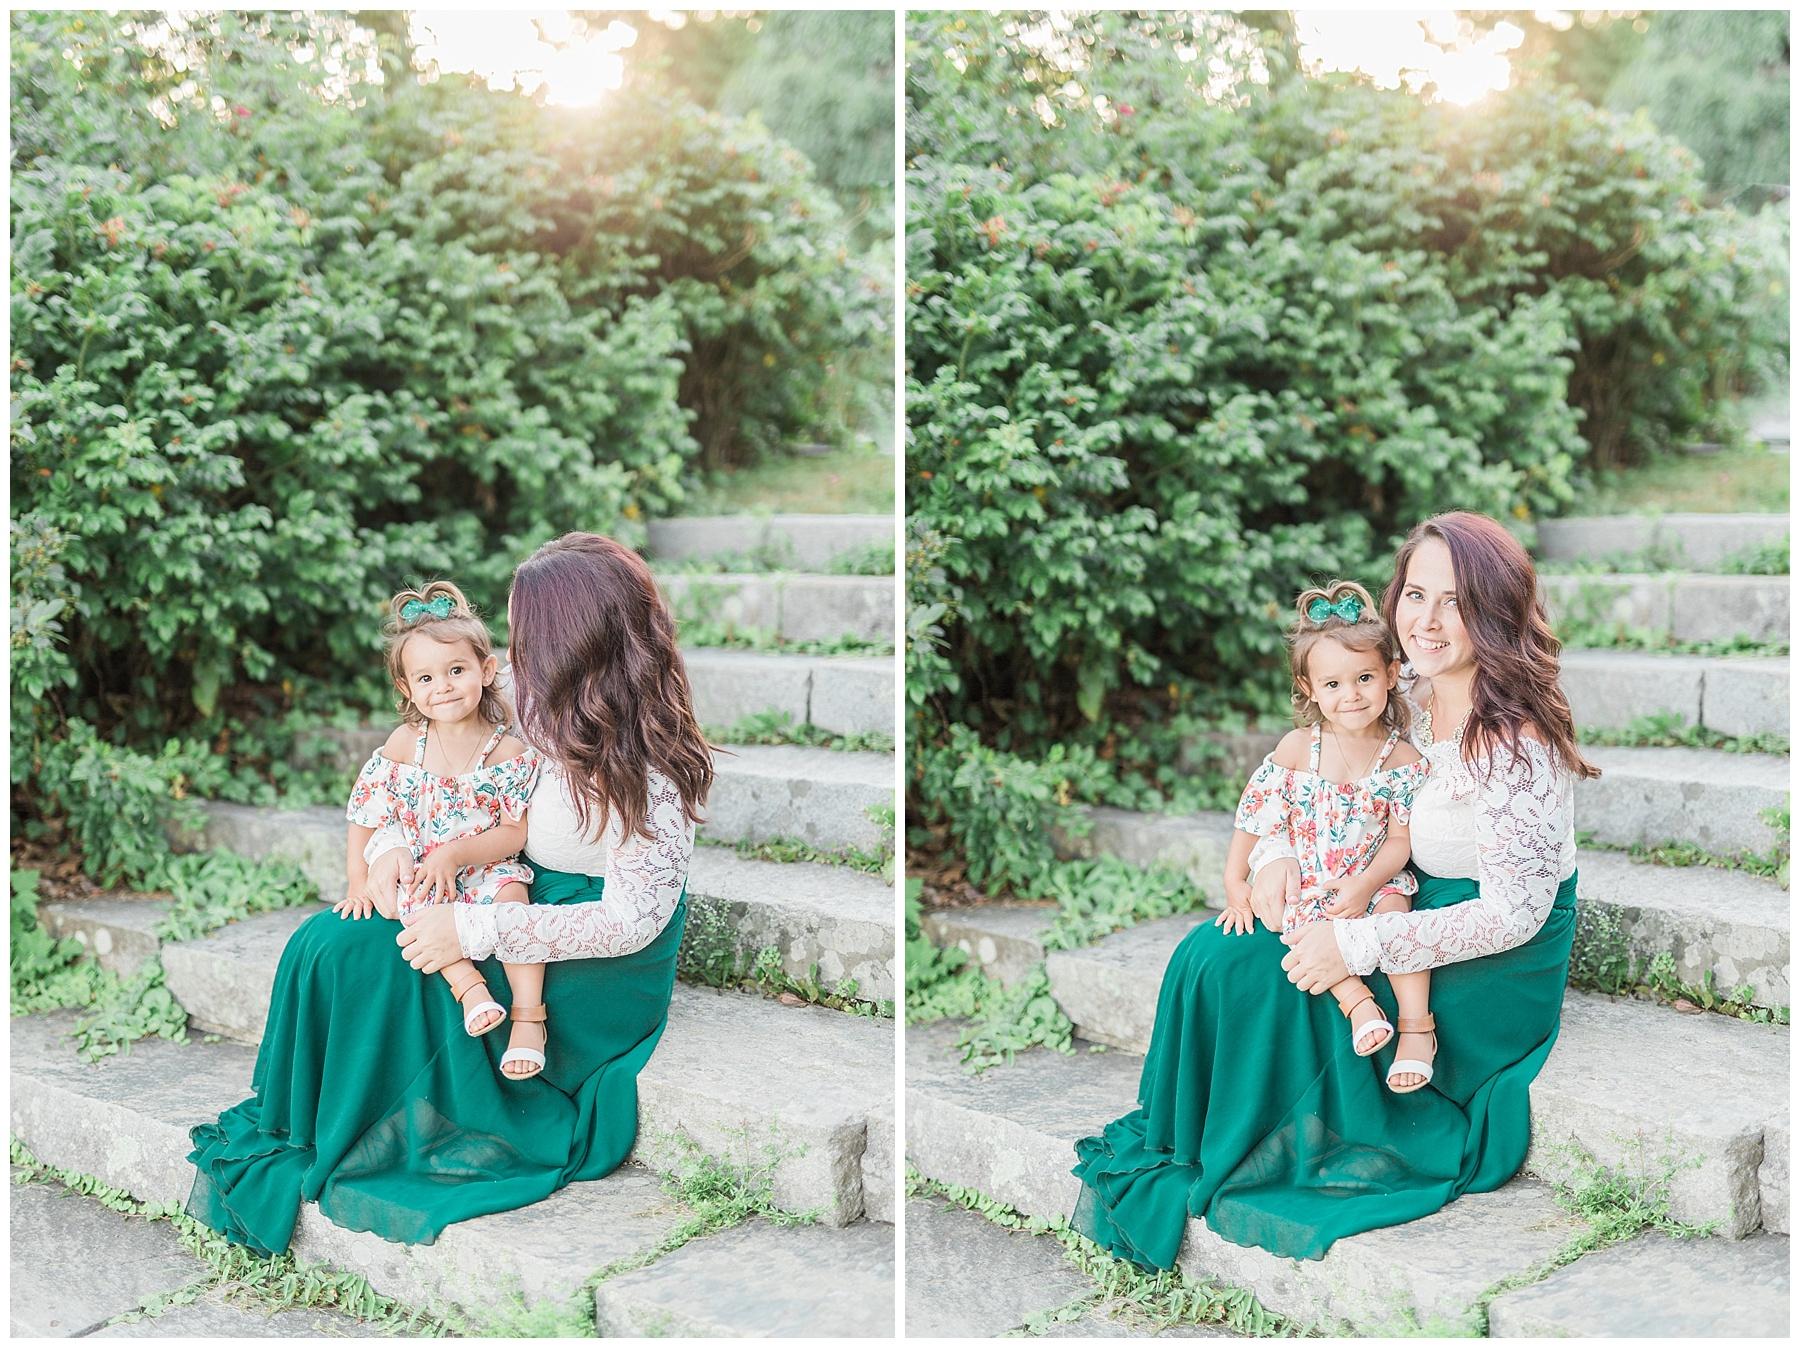 camden amphitheater and mt battie family portrait session